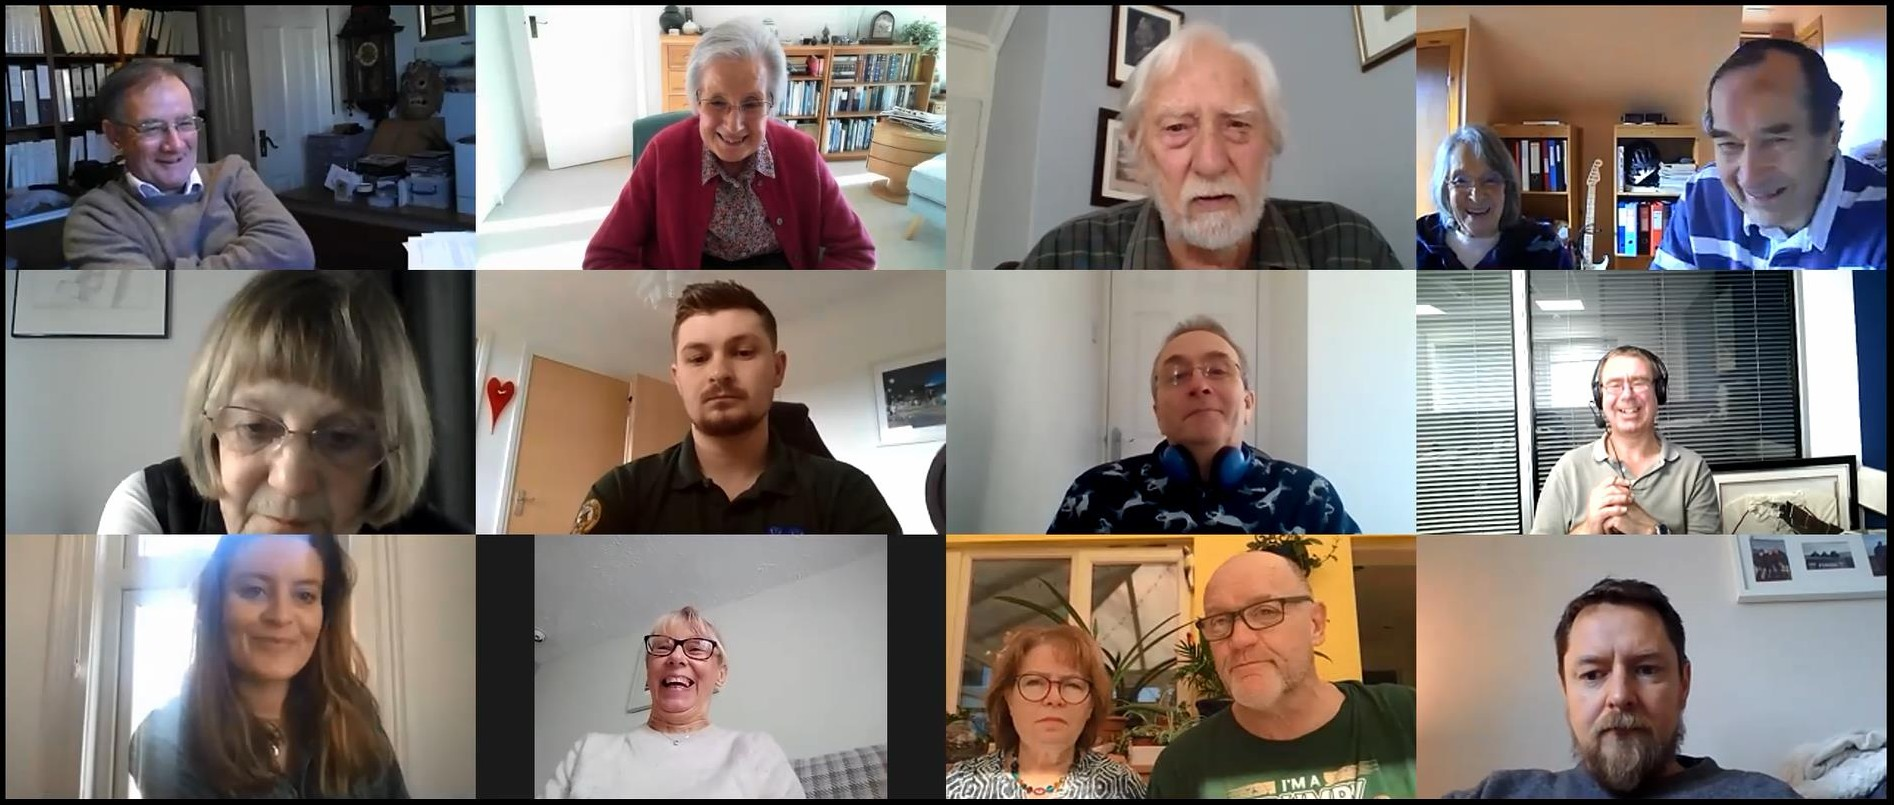 Clan Davidson Association Council meeting on Zoom